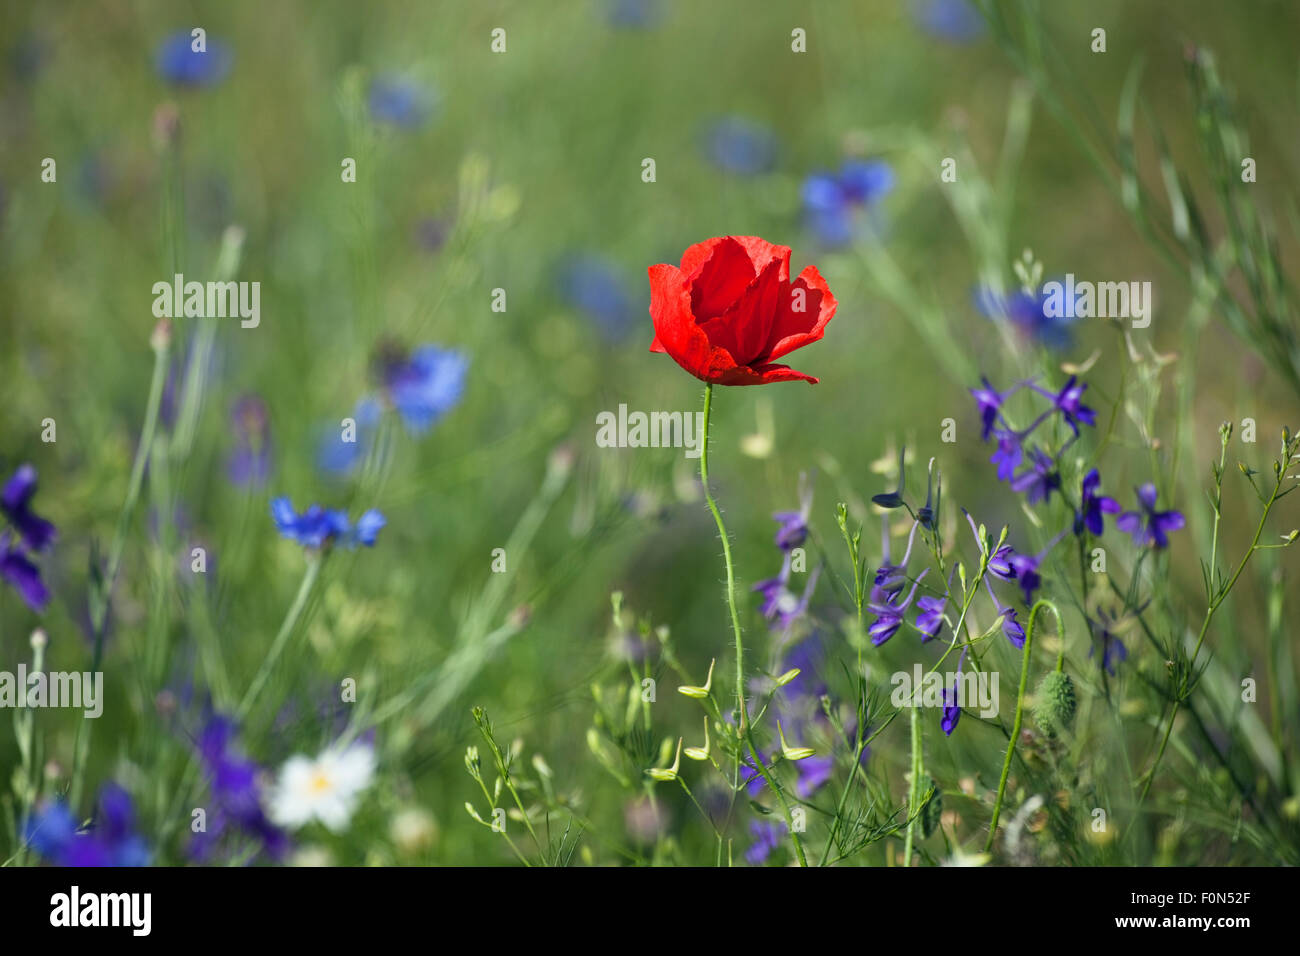 Red poppy (Papaver rhoeas) Brown knapweed (Centaurea jacea) and (Delphinium / Consolida regalis) flowers, Western - Stock Image